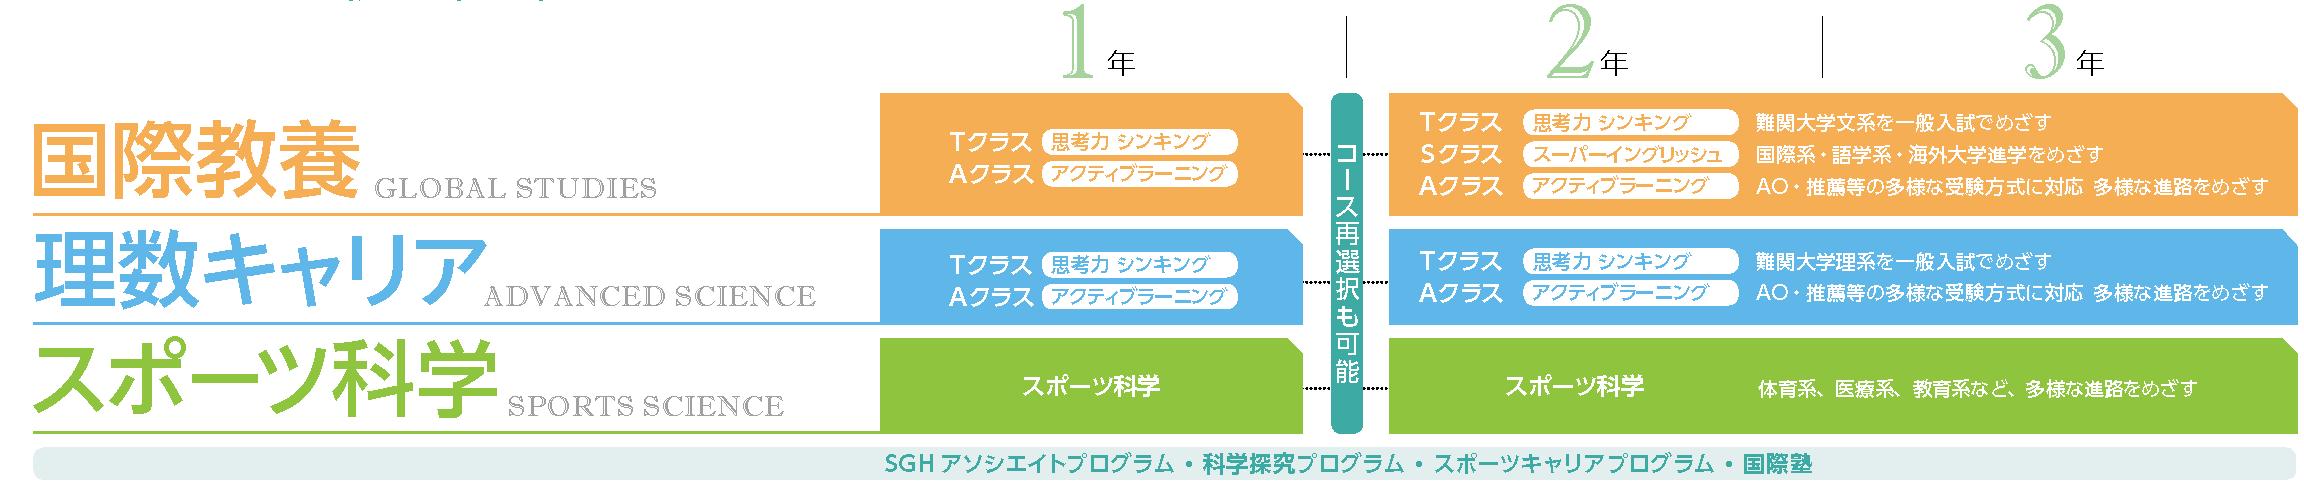 bunkyo_high_05_ページ_08.png